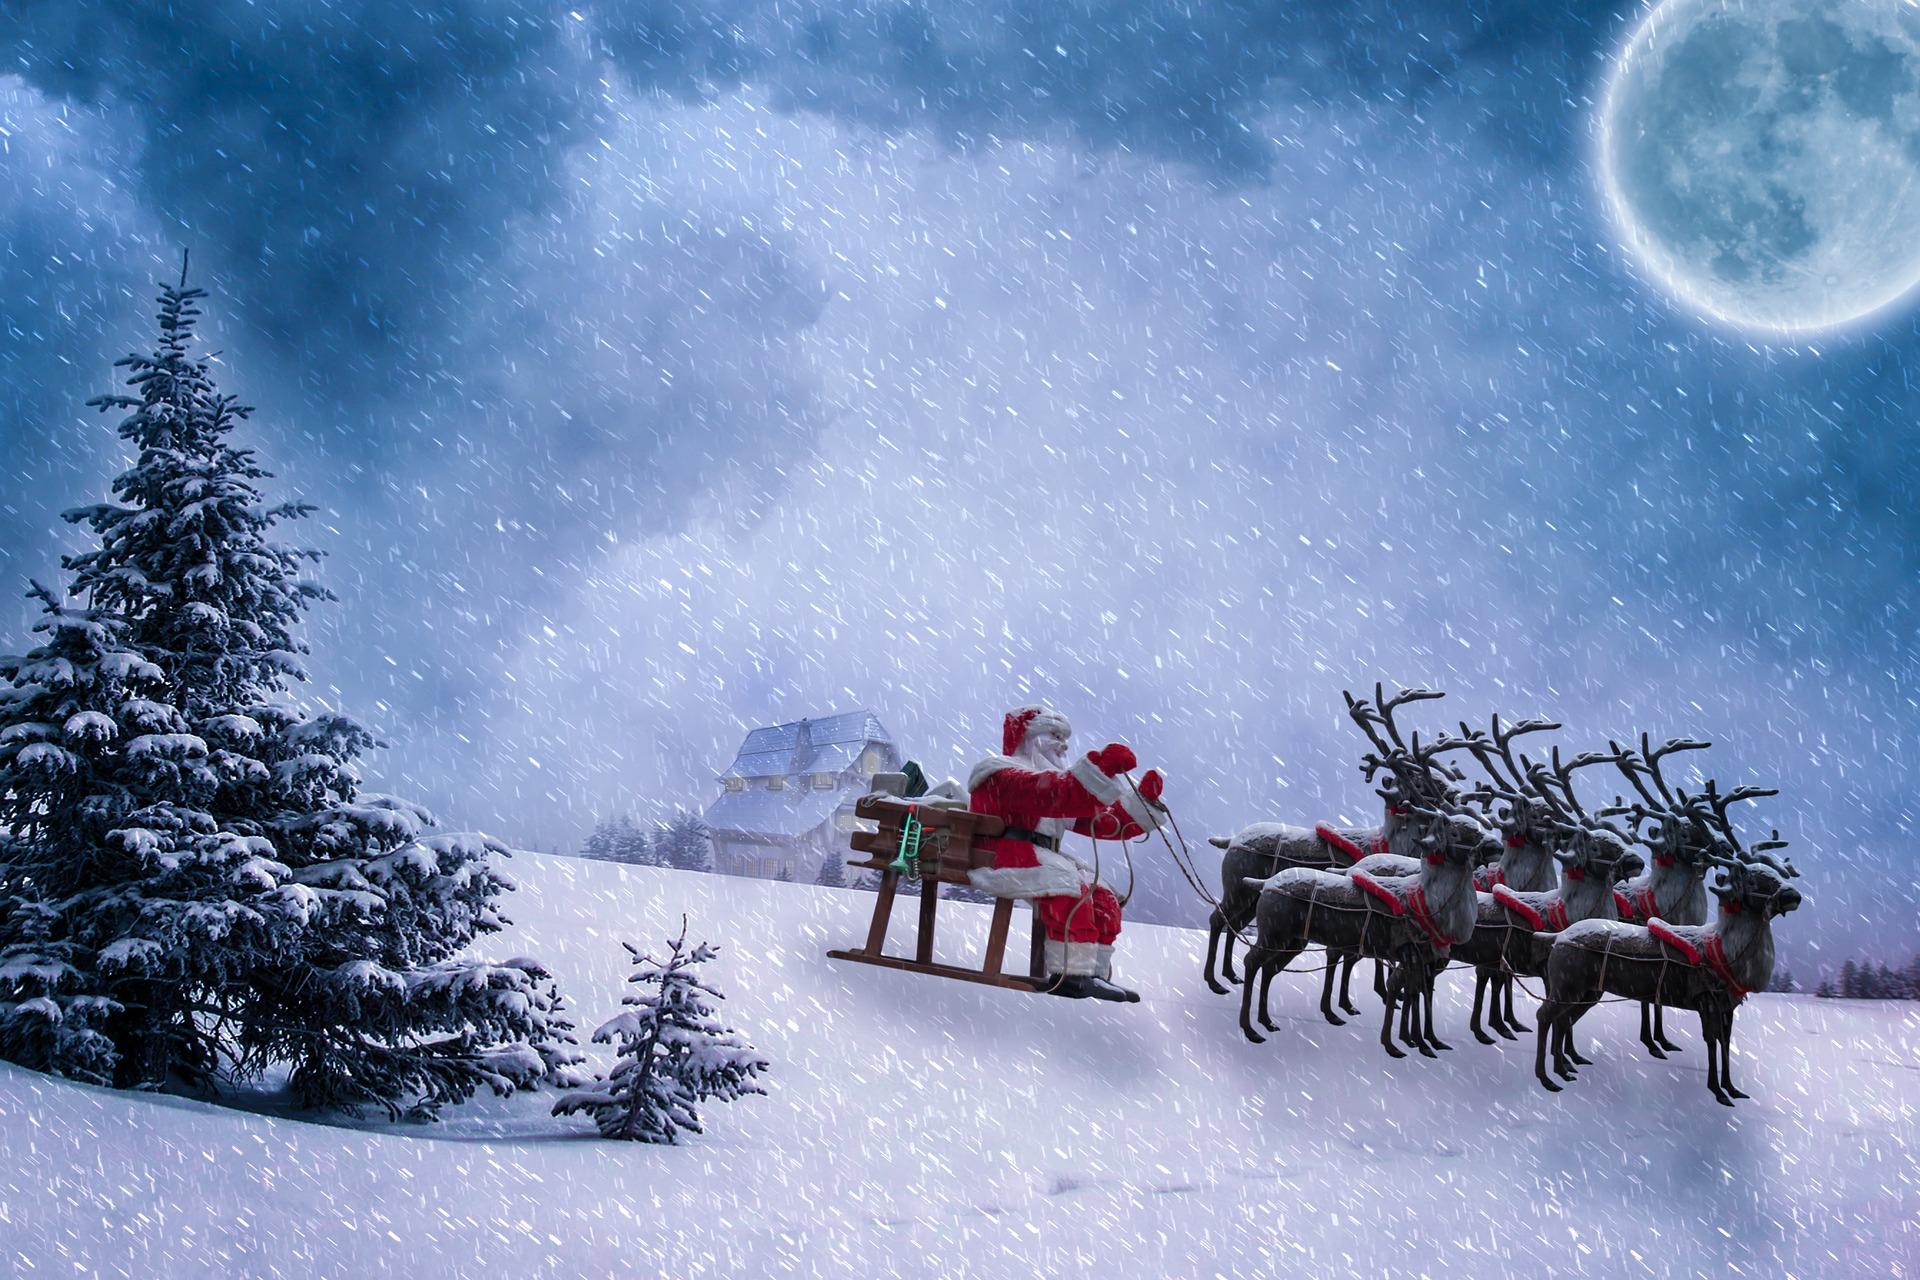 Why Did Santa Chose Female Reindeer To Help Him Deliver